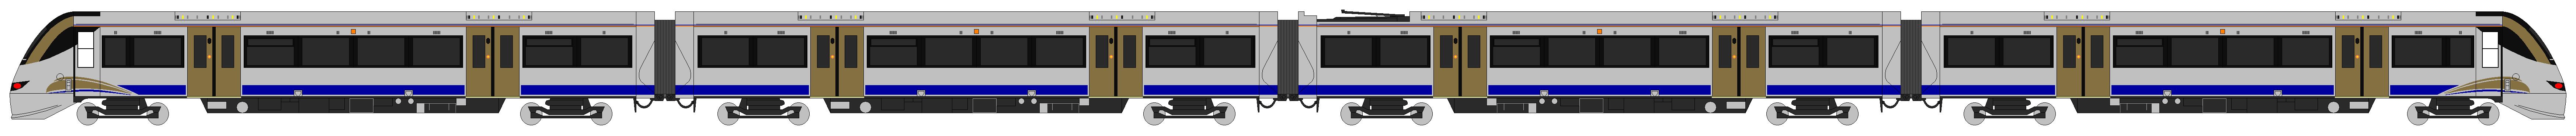 Paper Train Diagram Wiring Diagrams Art Engine File Gautrain Electrostar Wikimedia Commons Locomotive Steam